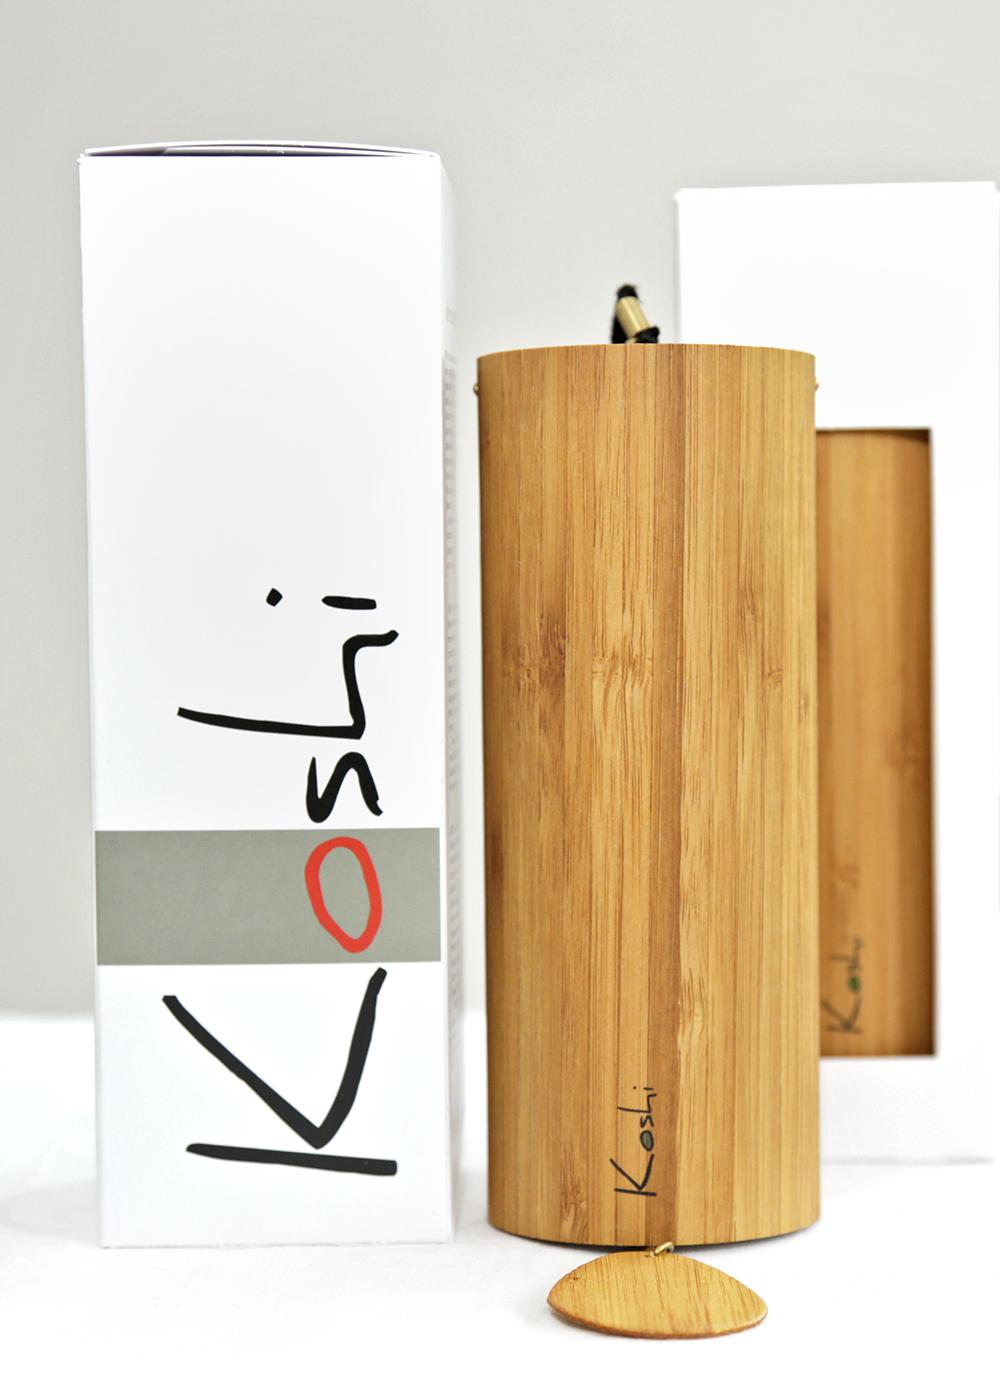 koshi klangspiel gesundschenken. Black Bedroom Furniture Sets. Home Design Ideas